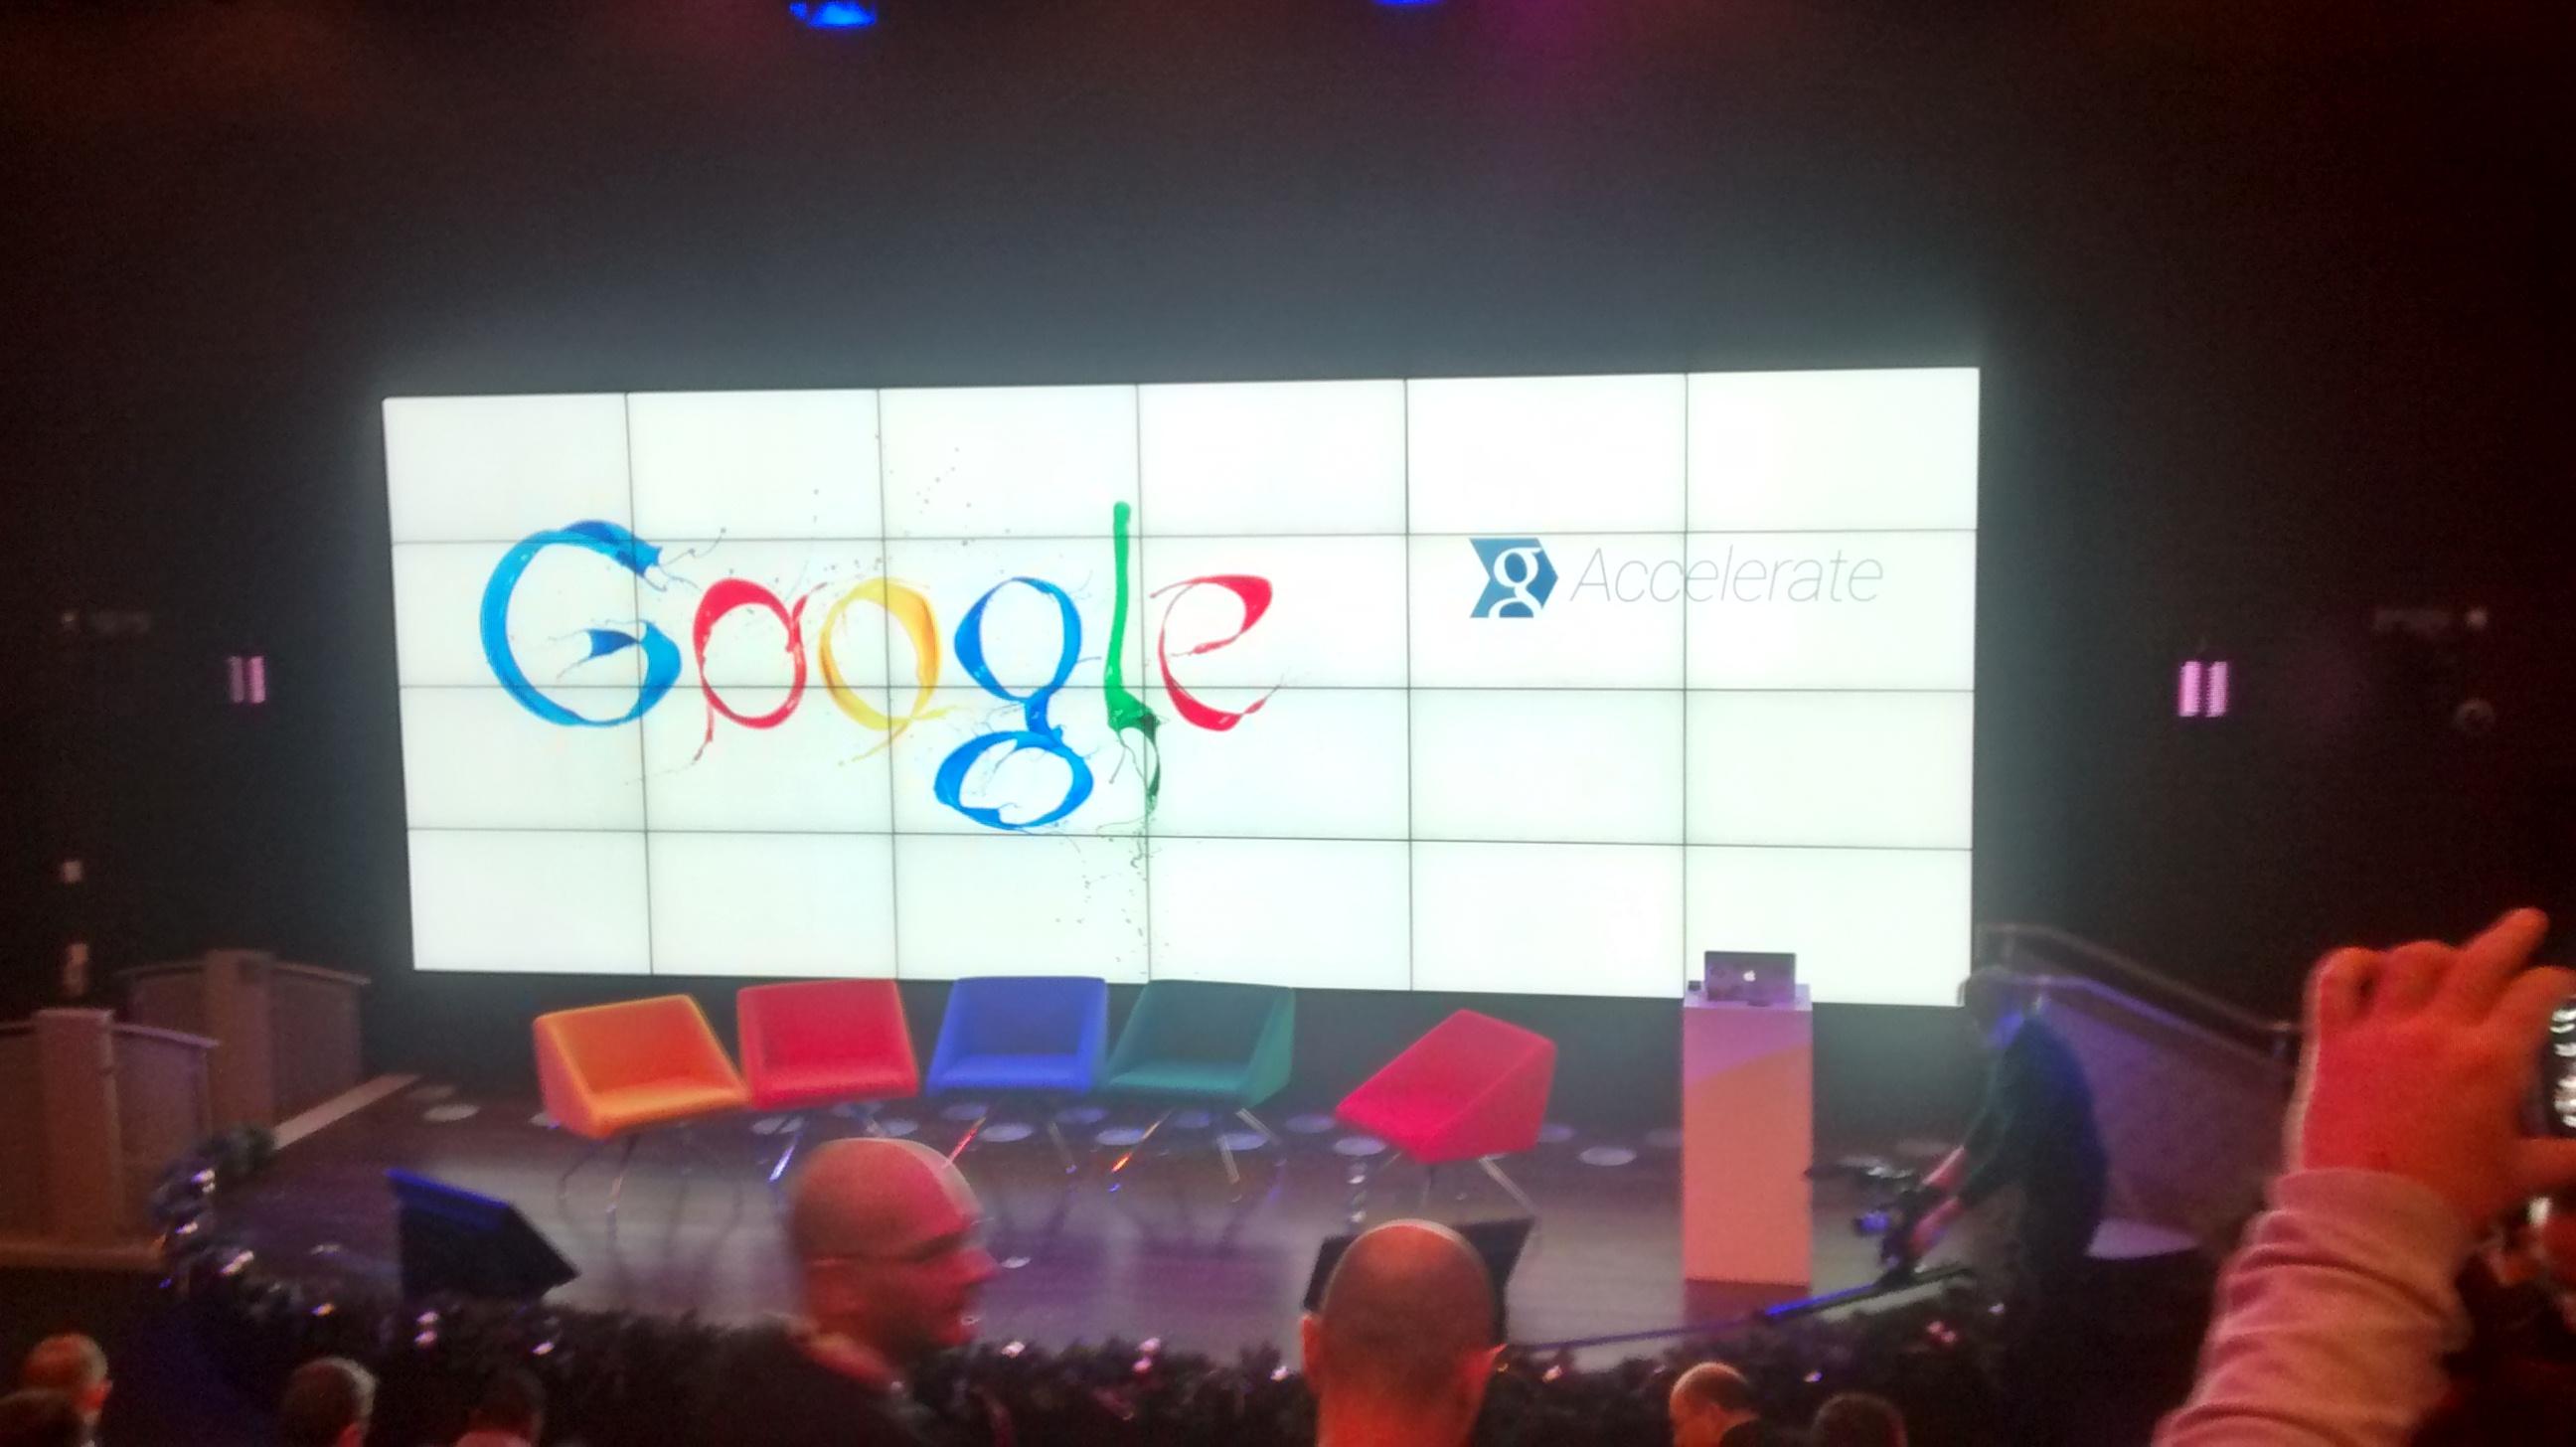 Google Partners Accelerate